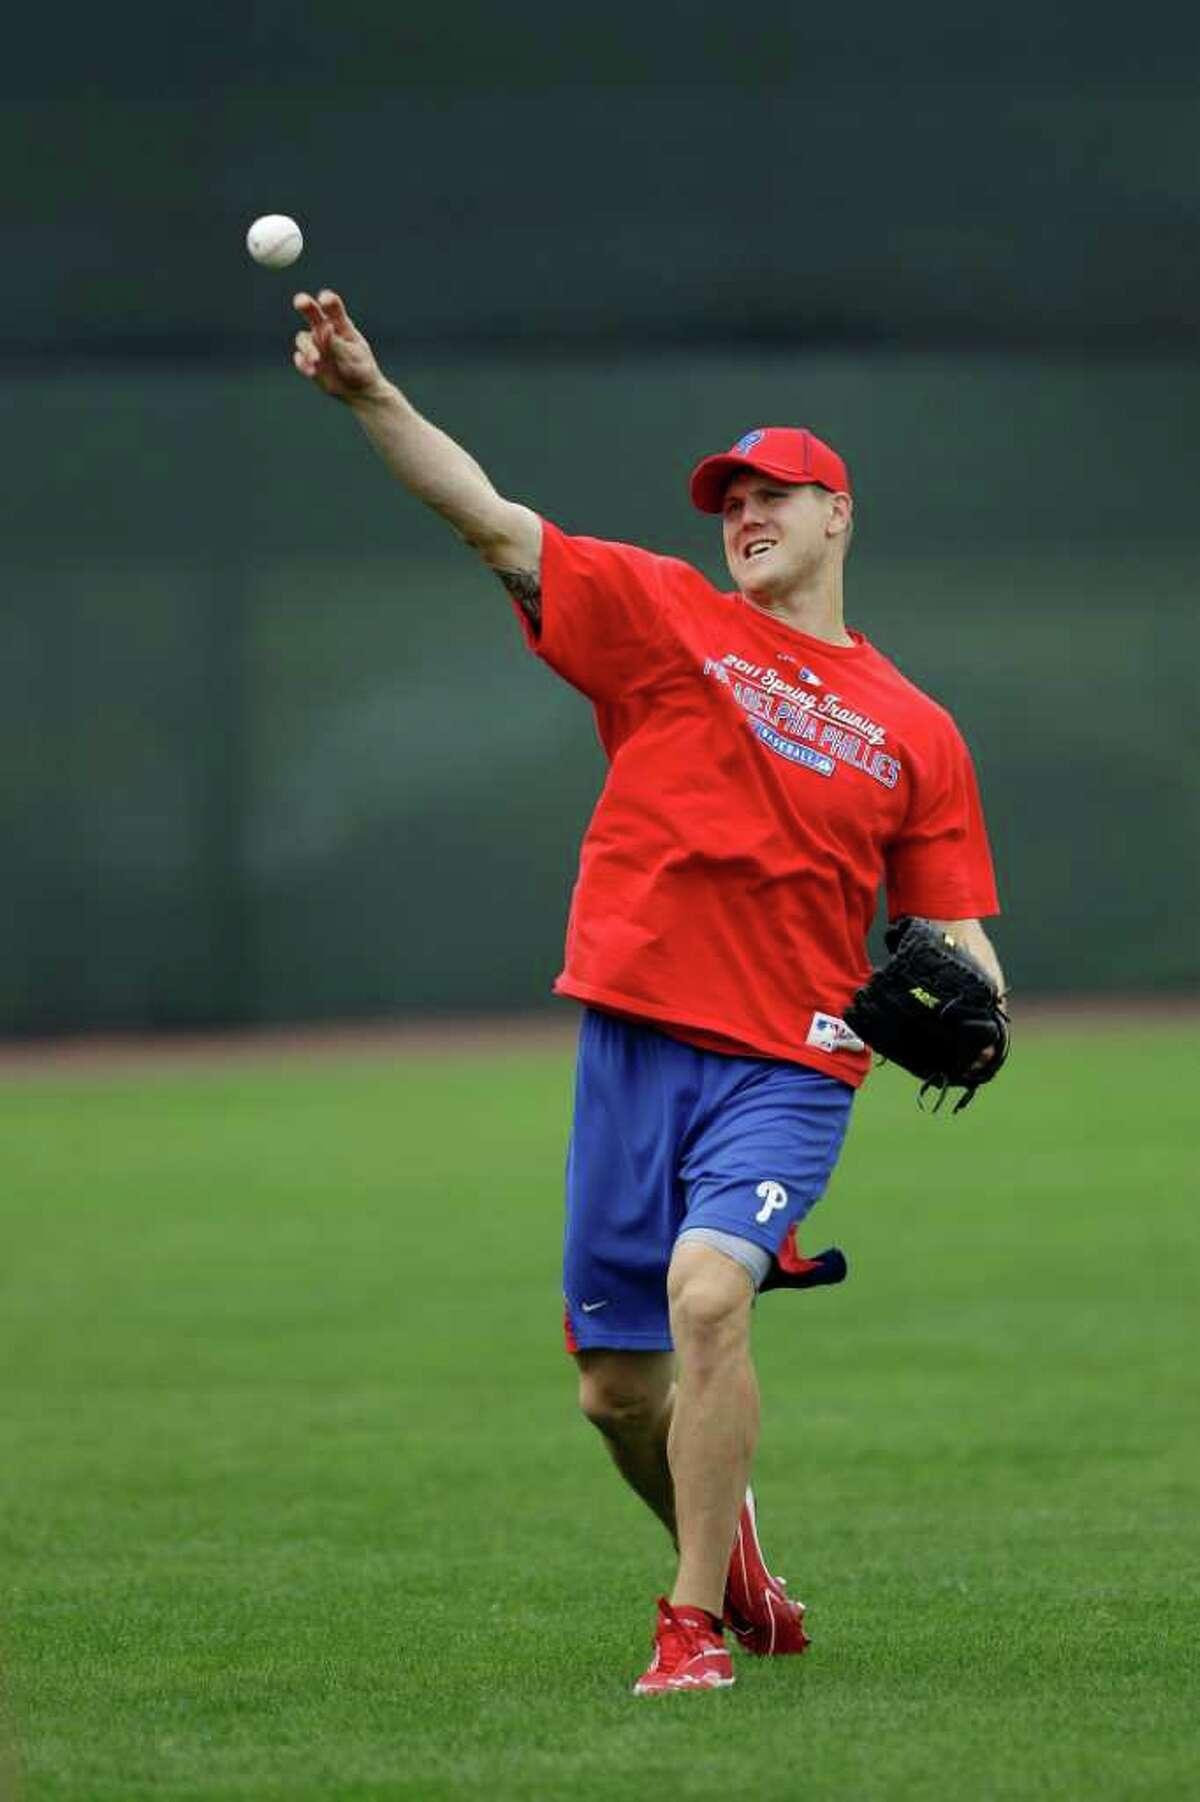 Philadelphia Philllies' Jonathan Papelbon throws during practice before the start of baseball spring training, Saturday, Feb. 18, 2012, in Clearwater, Fla. (AP Photo/Matt Slocum)